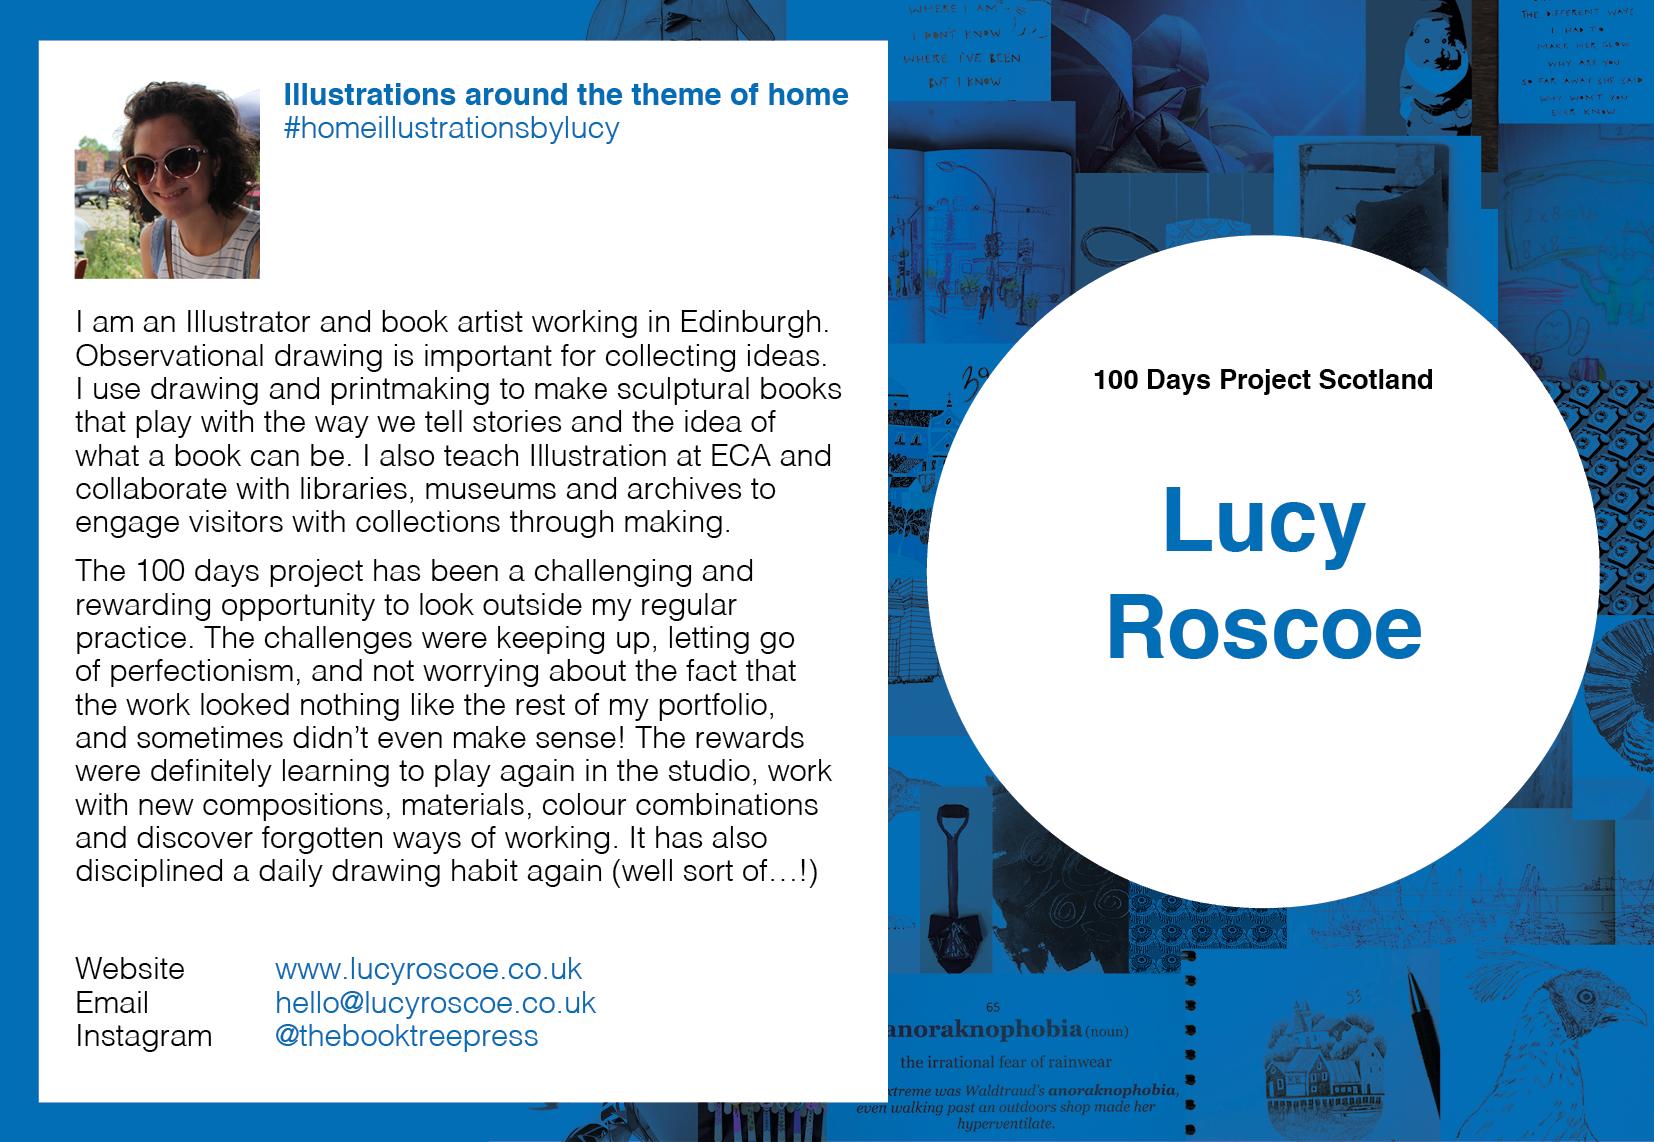 Lucy Roscoe